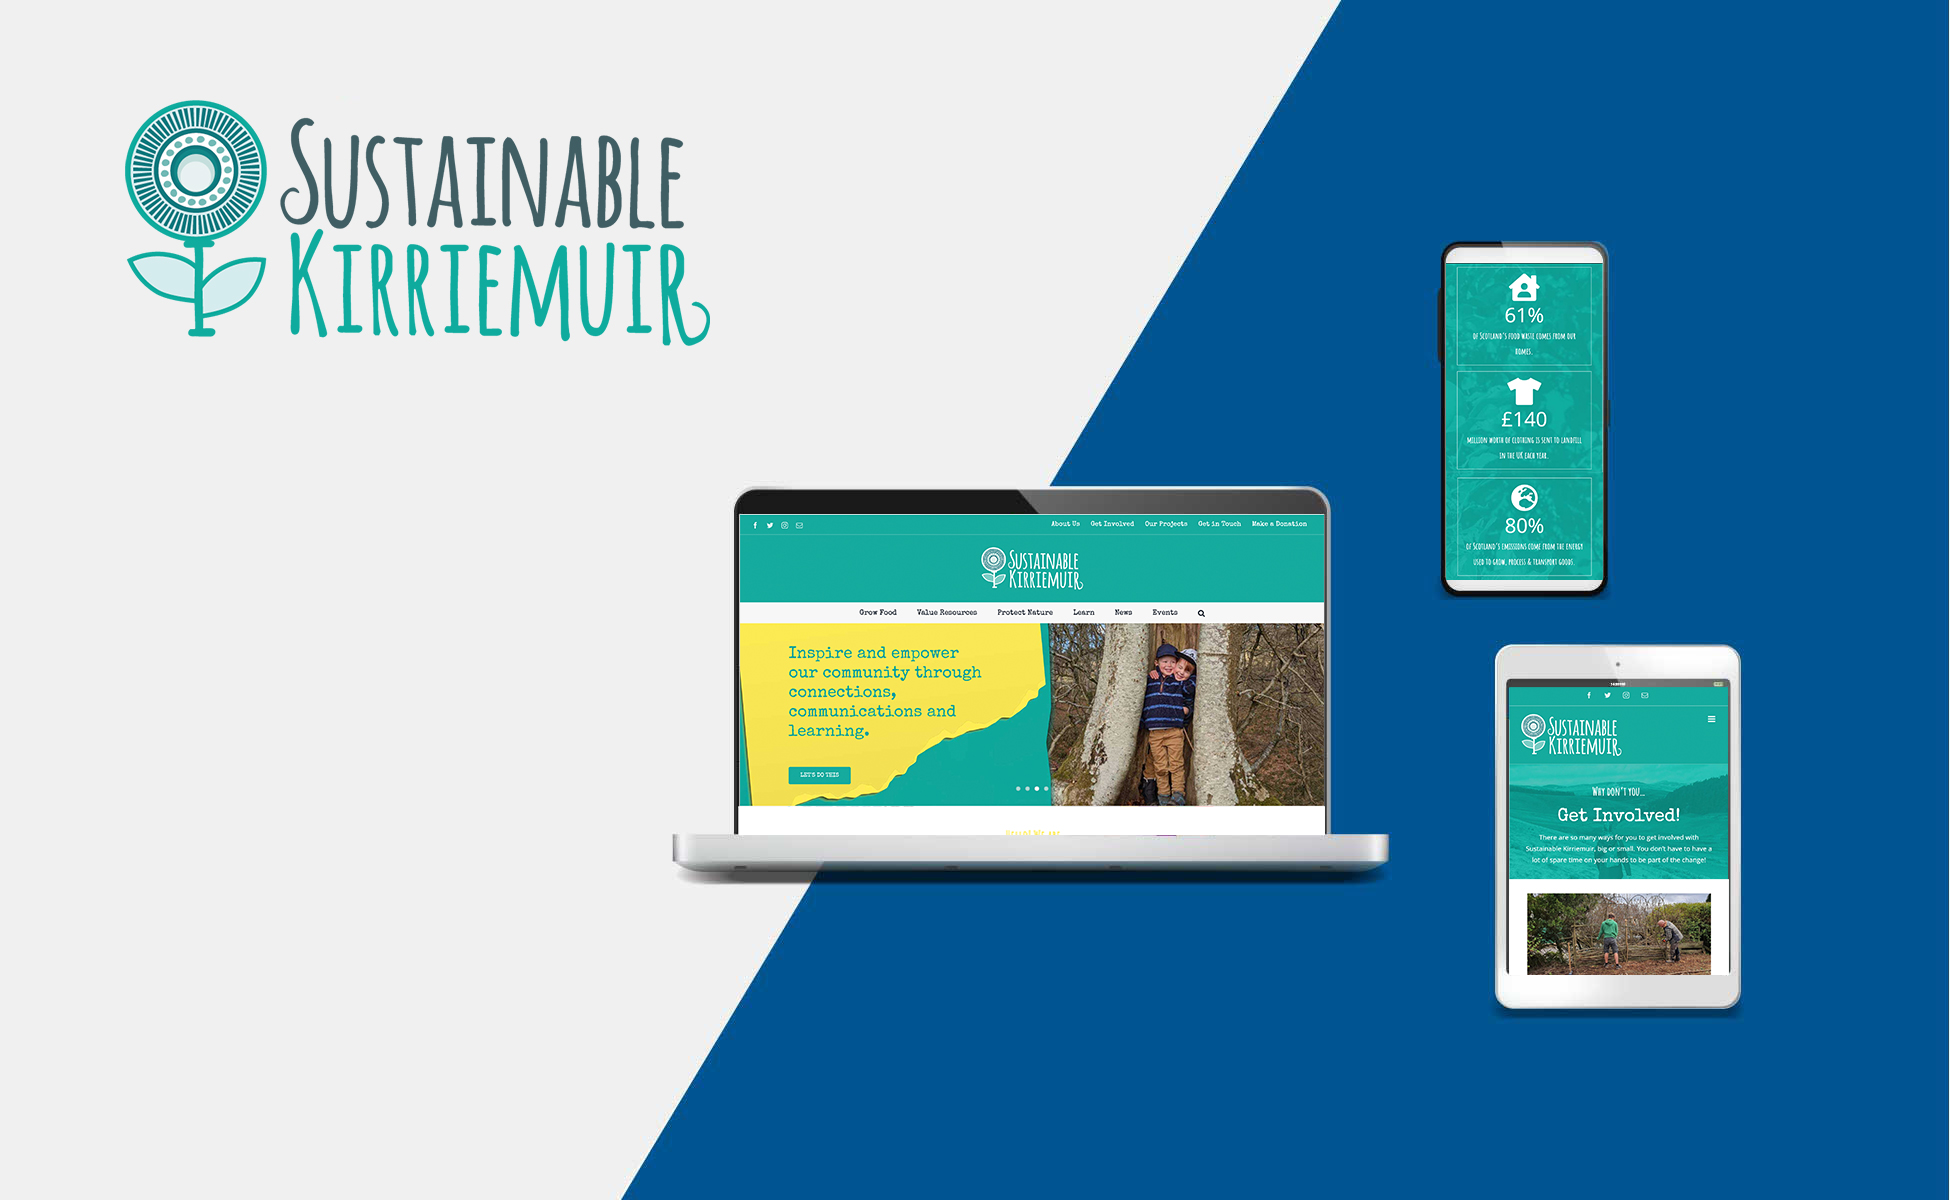 Sustainable Kirriemuir Website Design & Brand Development